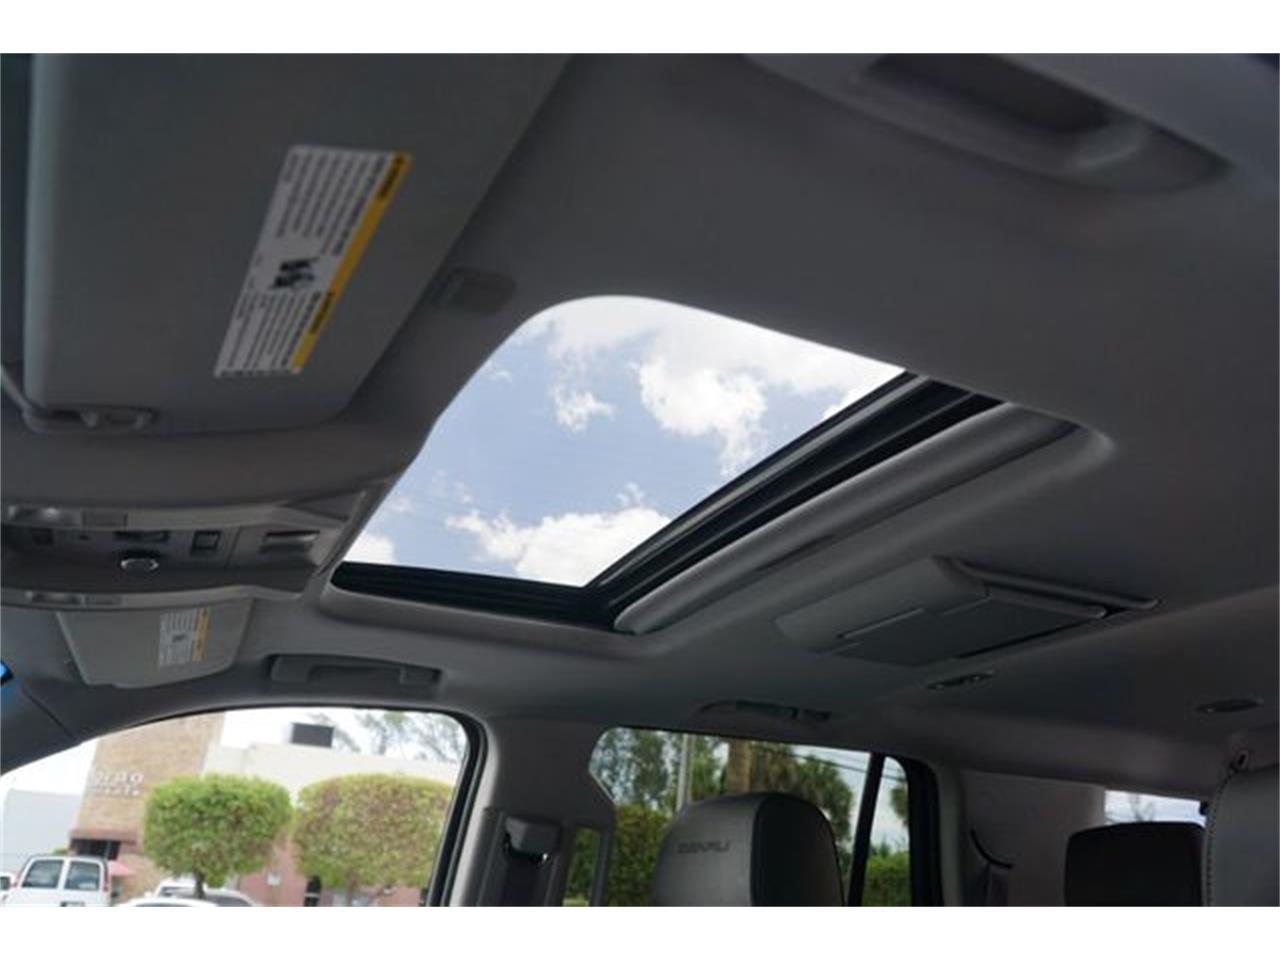 2015 GMC Yukon (CC-1246442) for sale in Miami, Florida